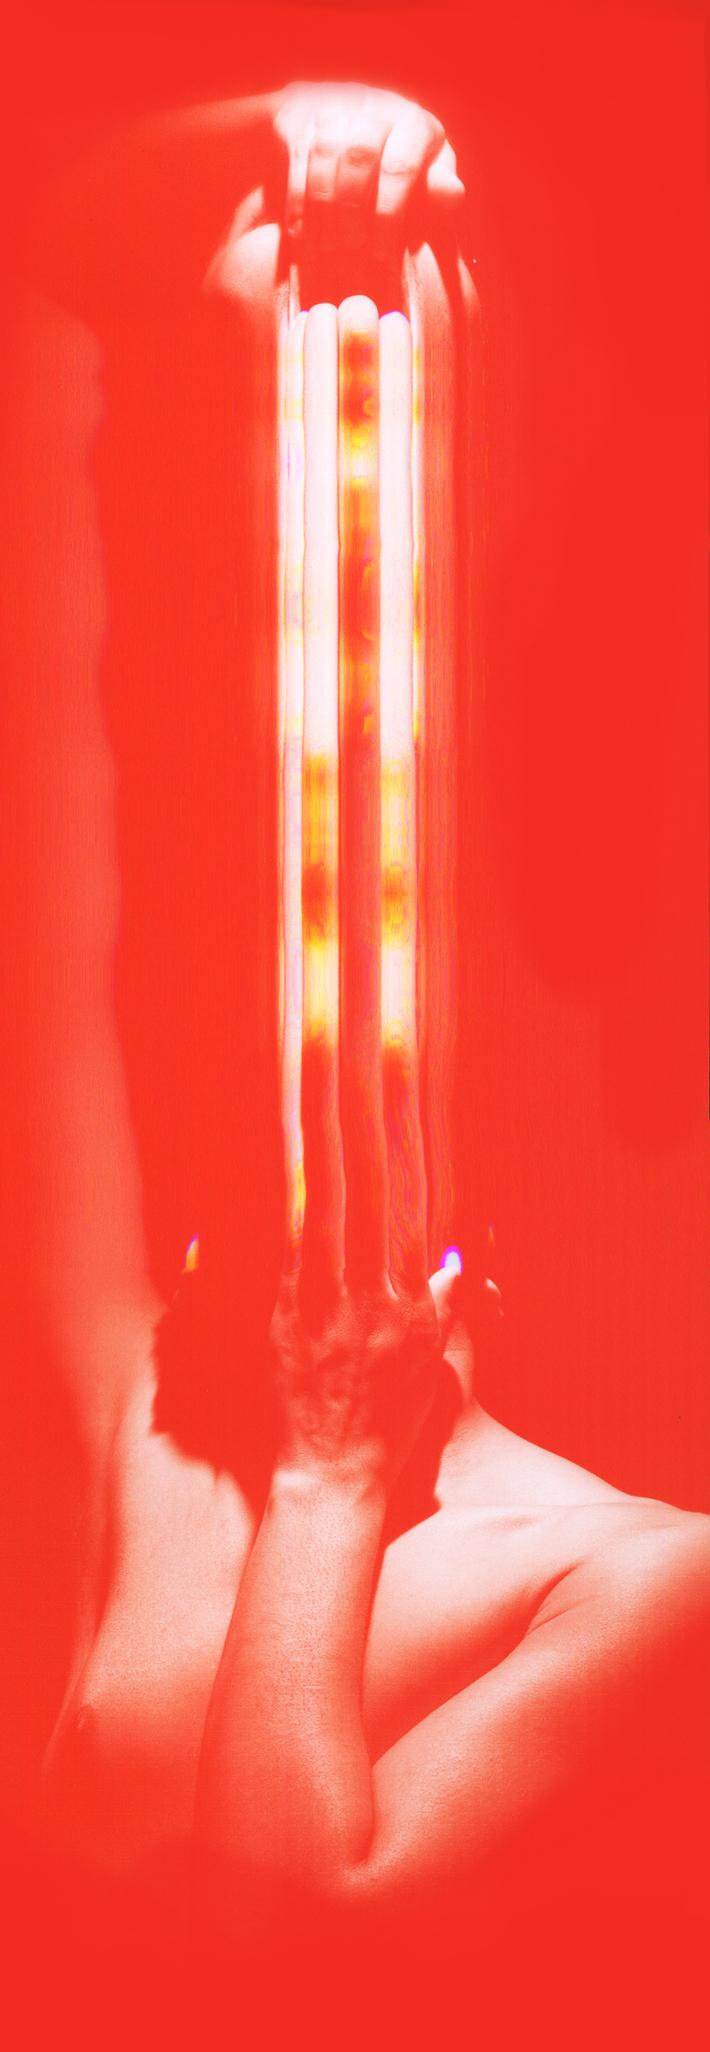 Untitled (Half-Pixel)